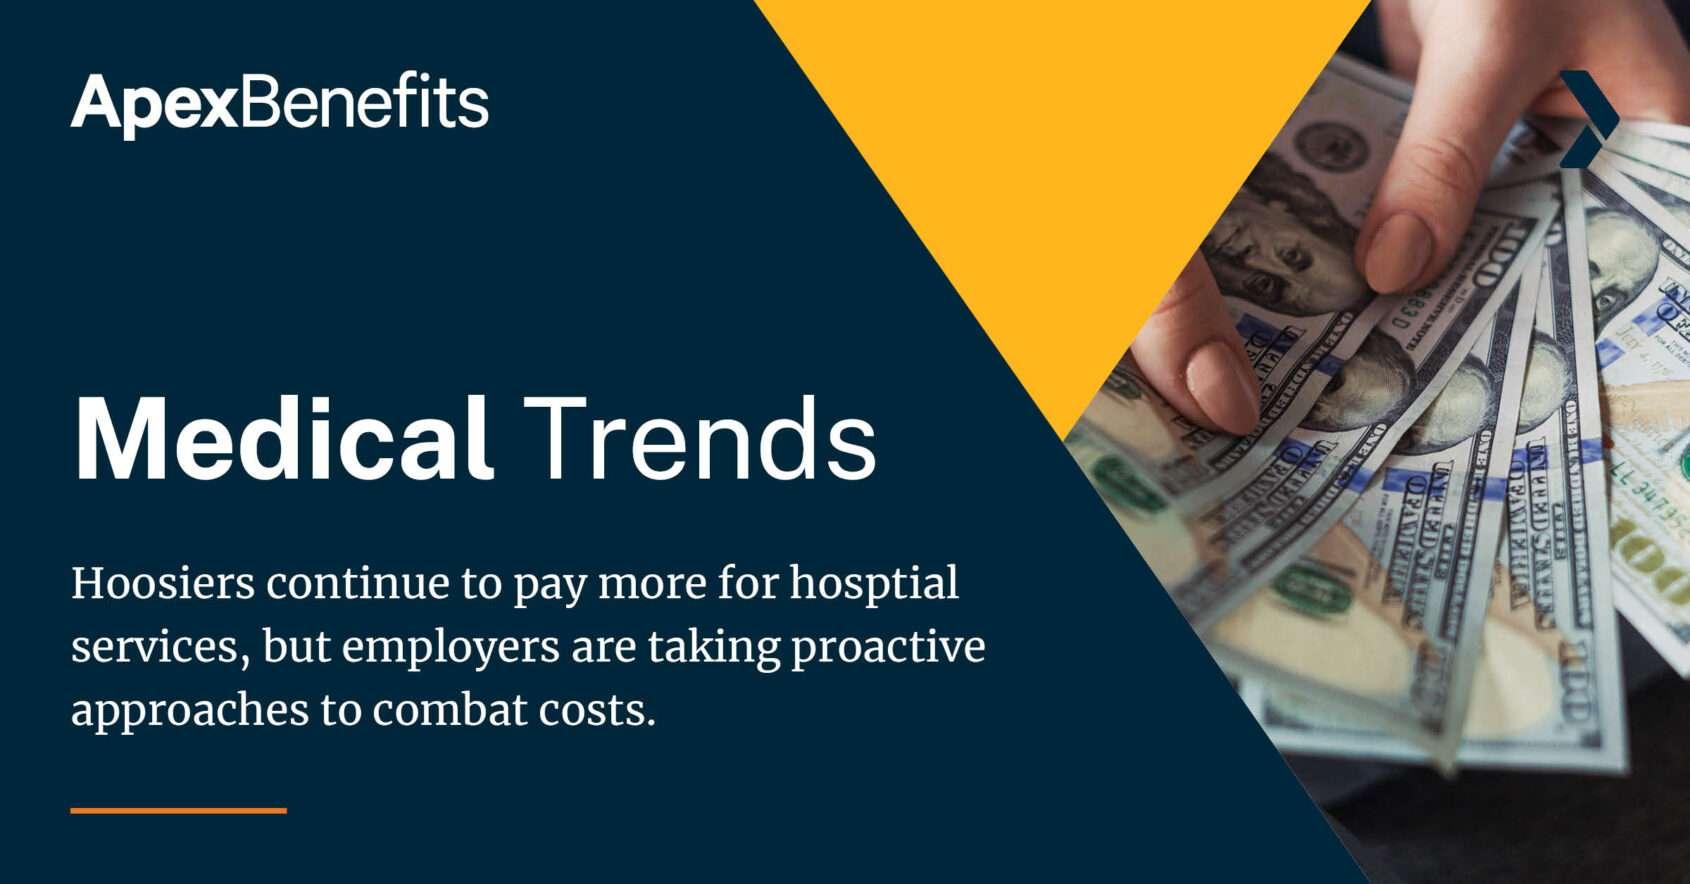 Medical Trends Benchmarking